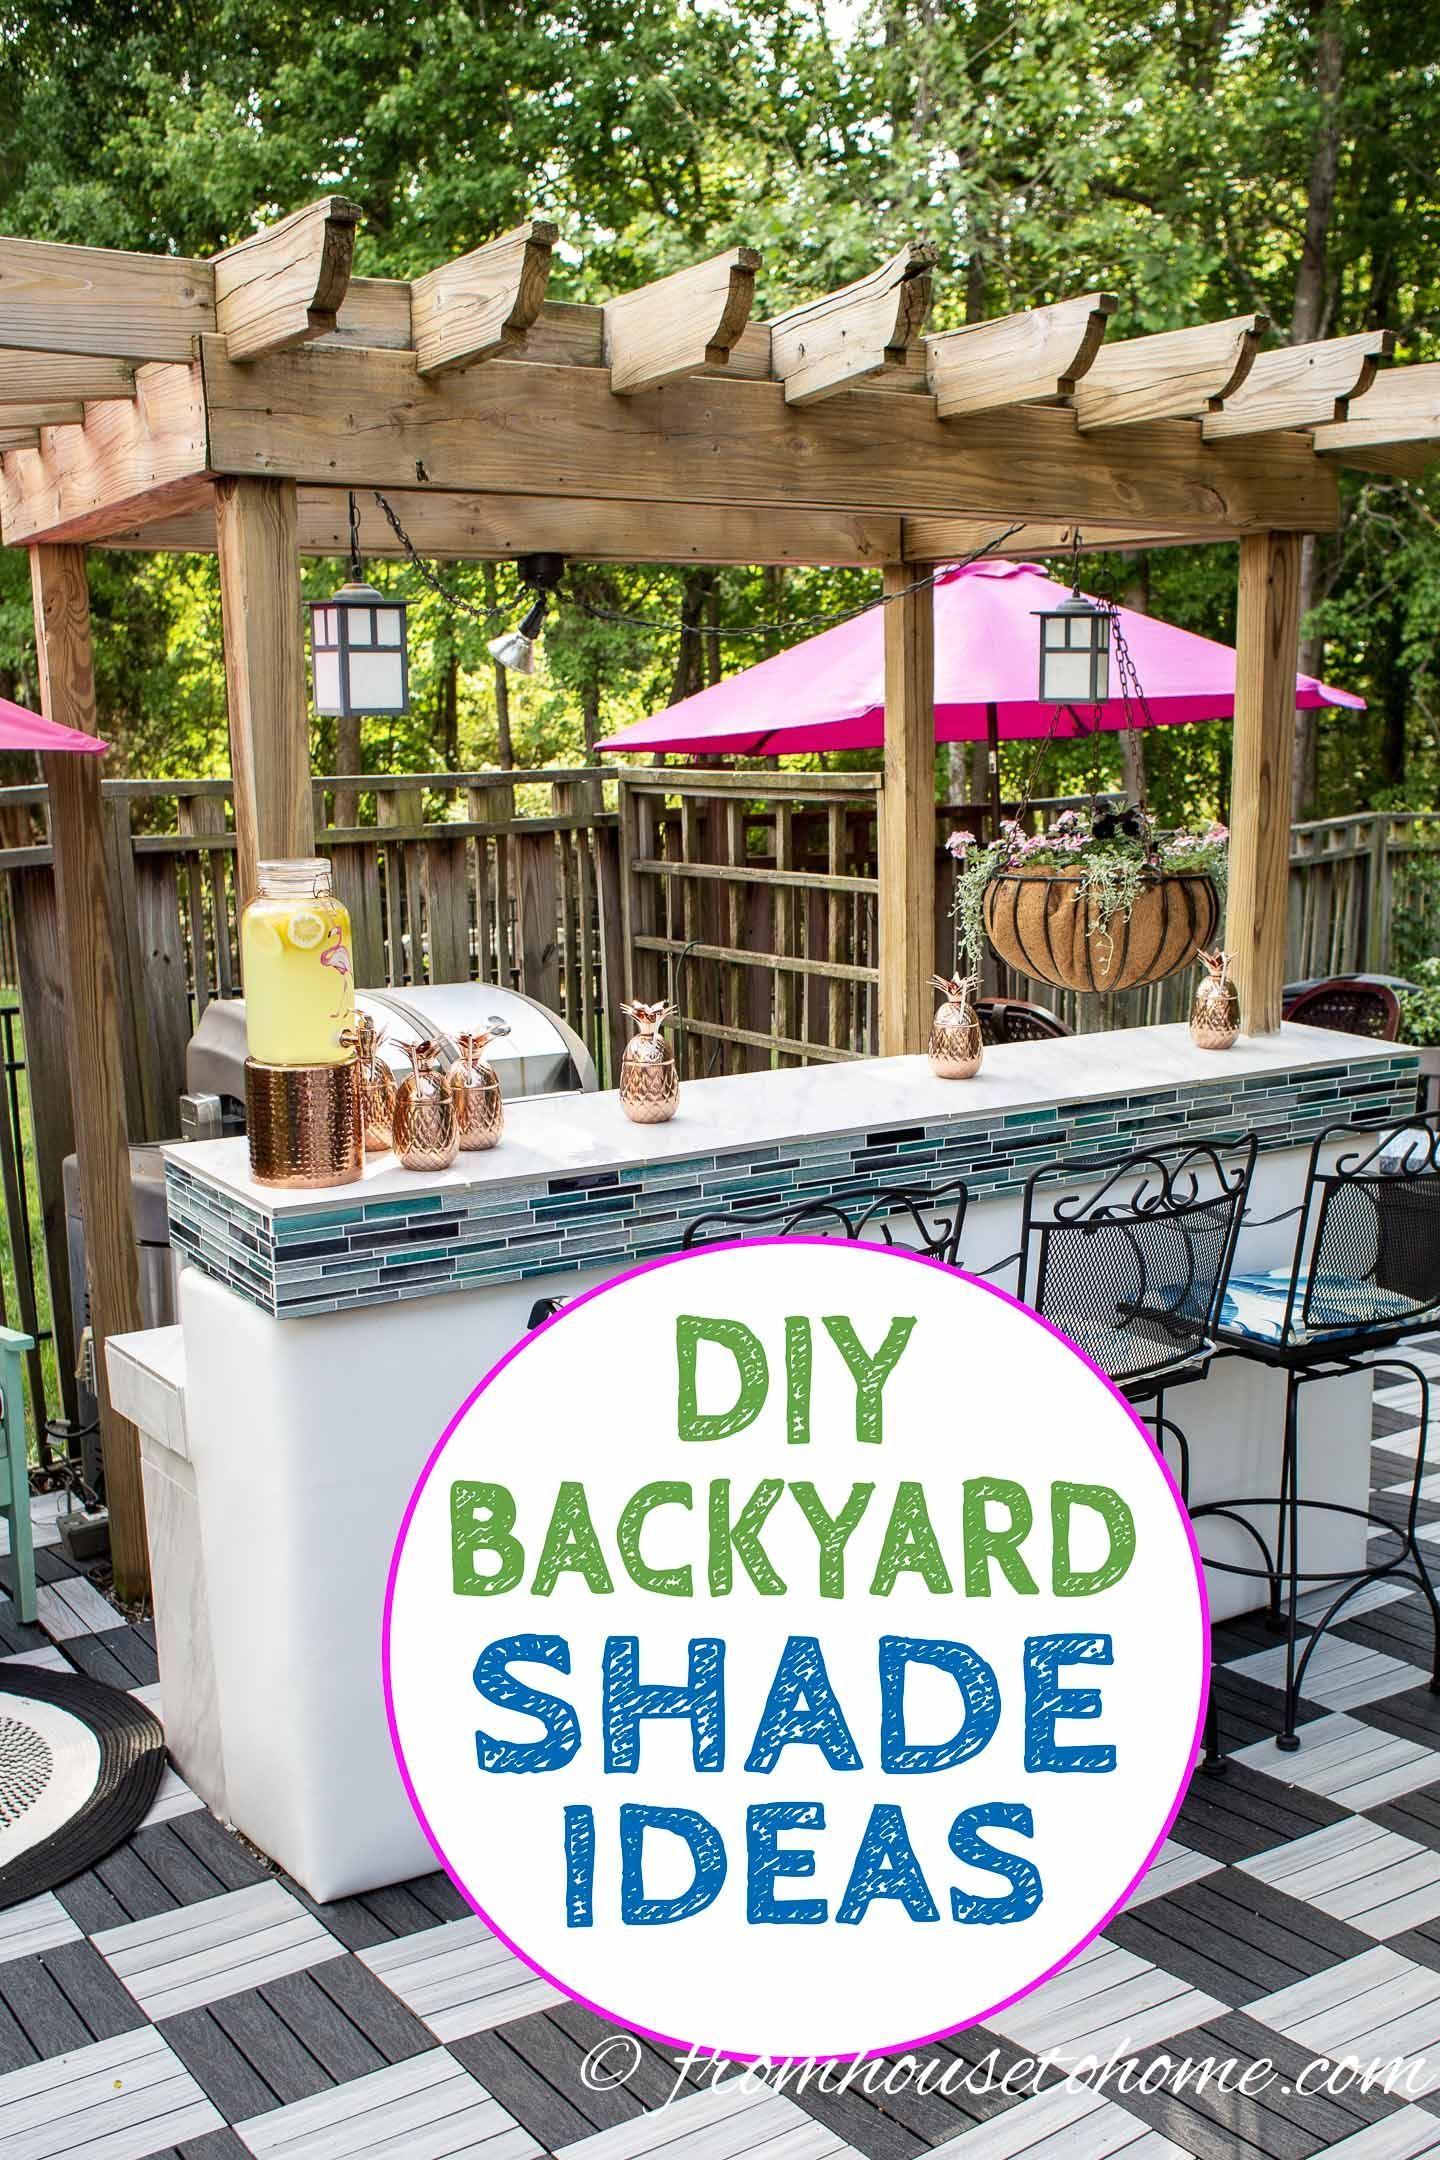 Backyard Shade Ideas: 9 Shade Solutions For Decks That ...